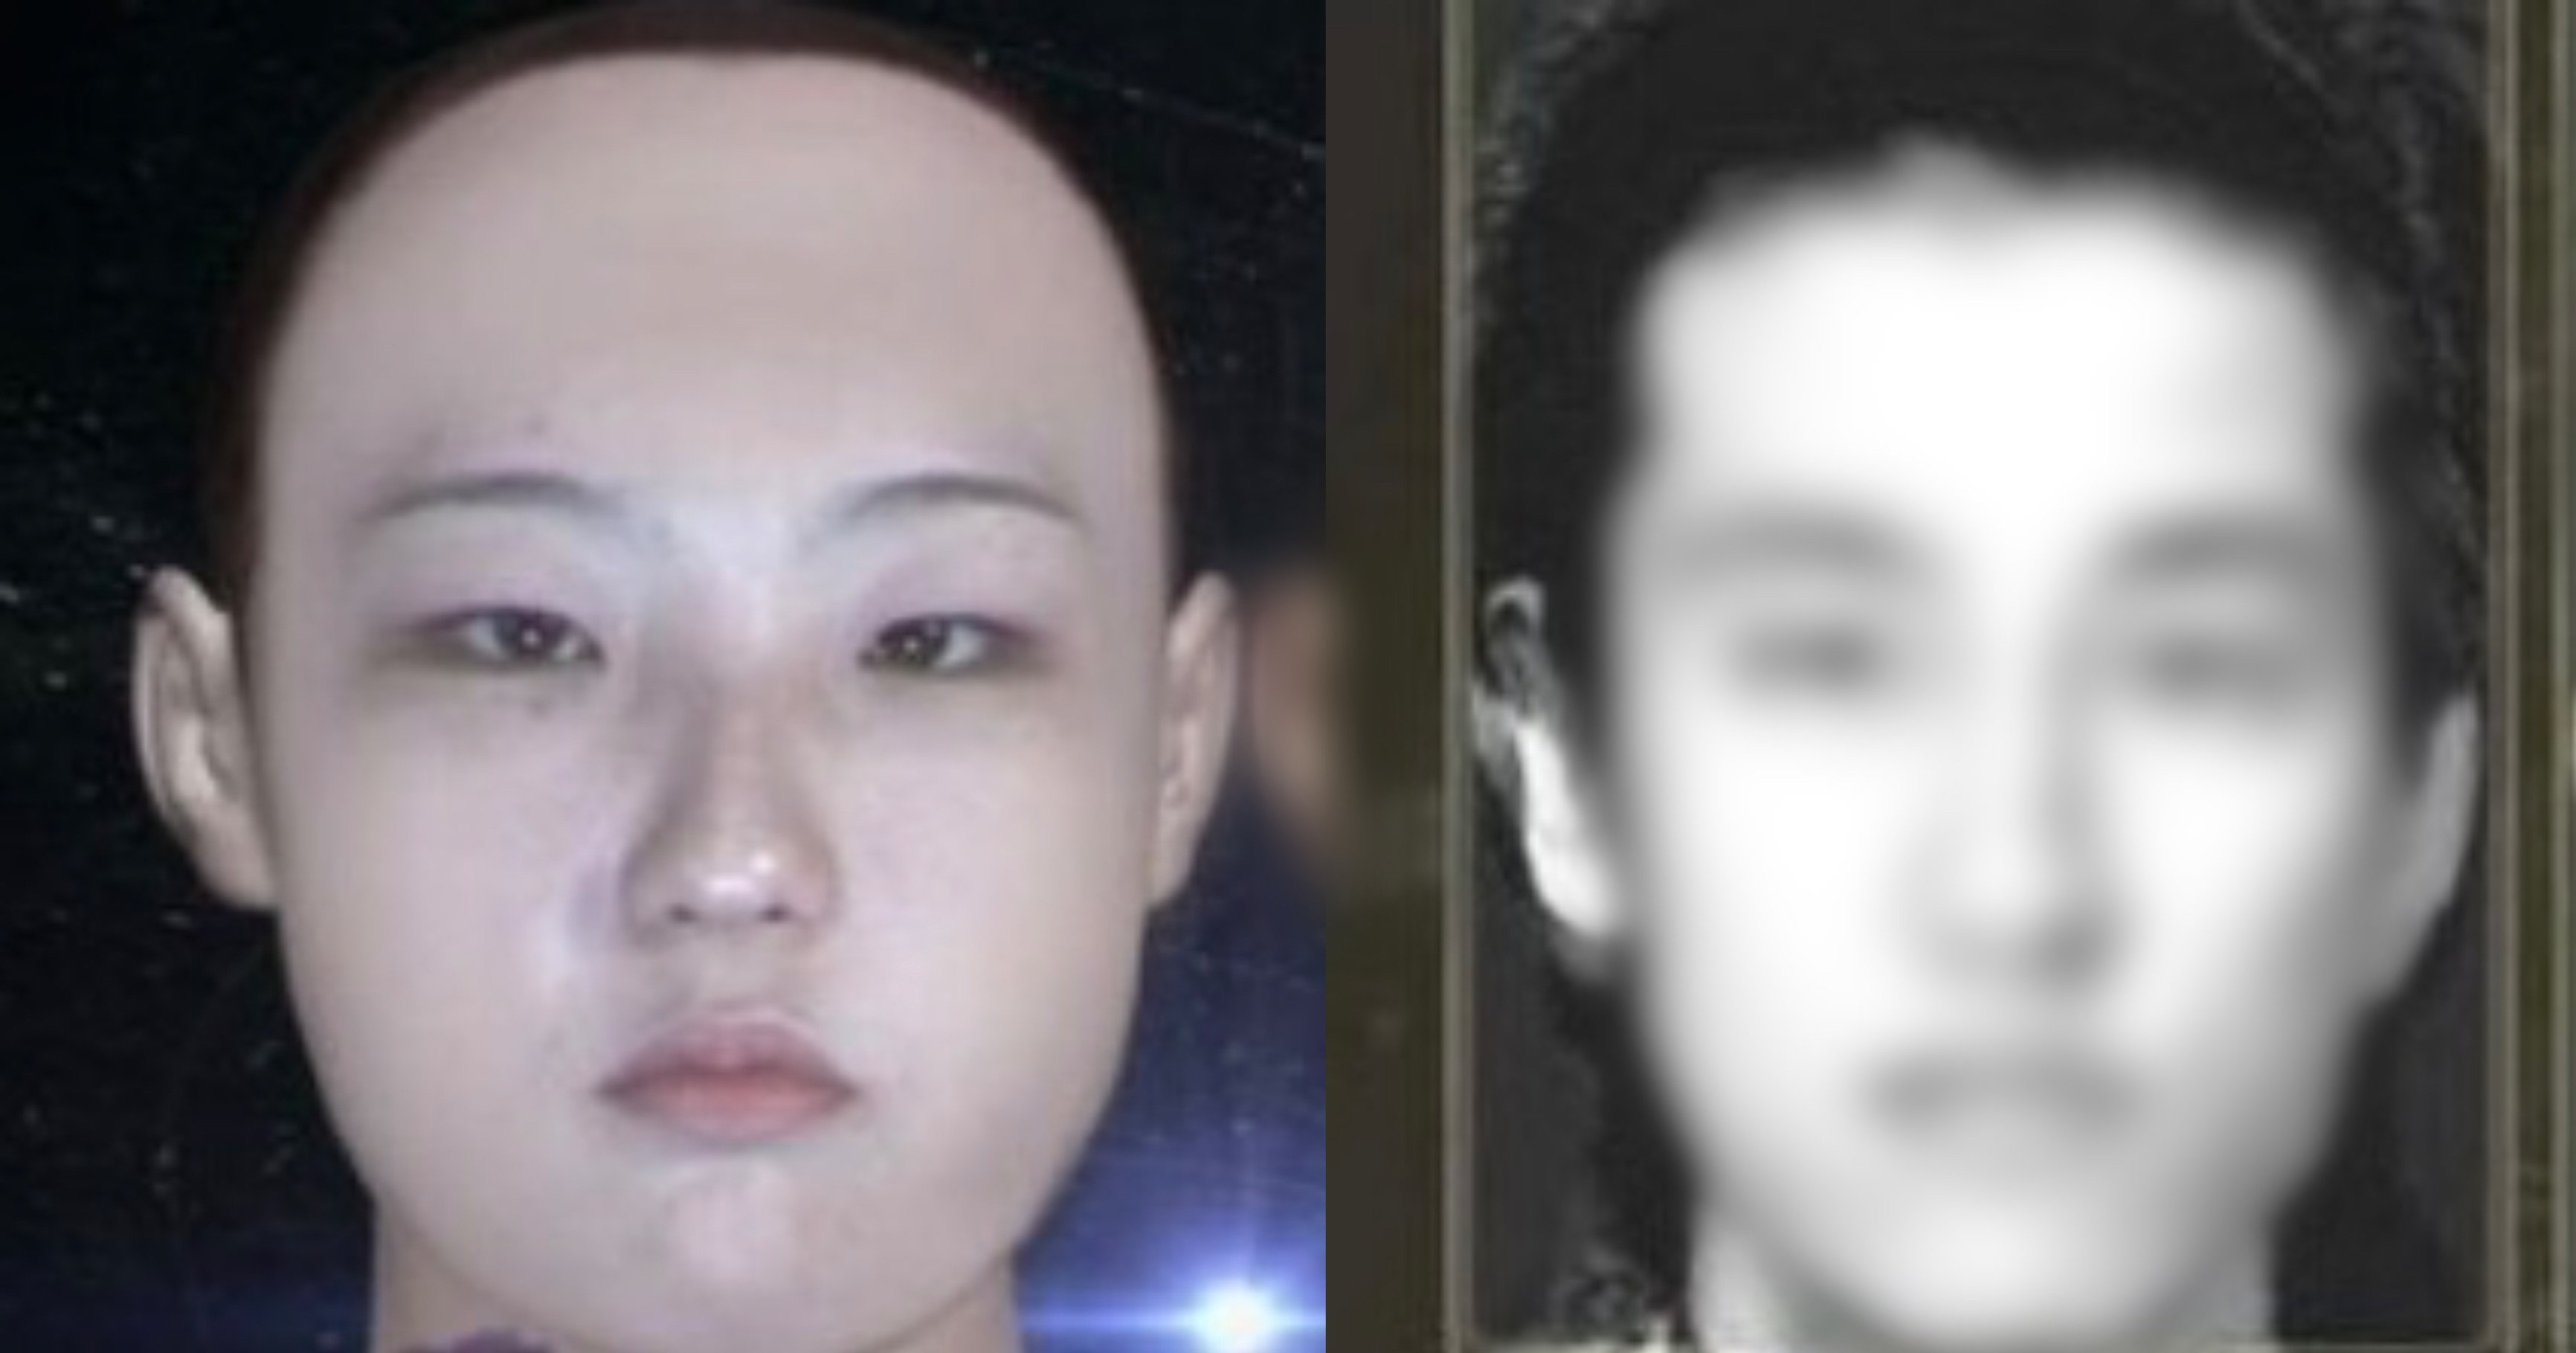 "a7086b68 40ce 479c bcca 53adb7fdca56.jpeg?resize=412,232 - ""이게 대한민국 평균 얼굴이라고? 난 평균 이상인듯""…20년 동안 분석한 한국 남녀의 '평균 얼굴'"